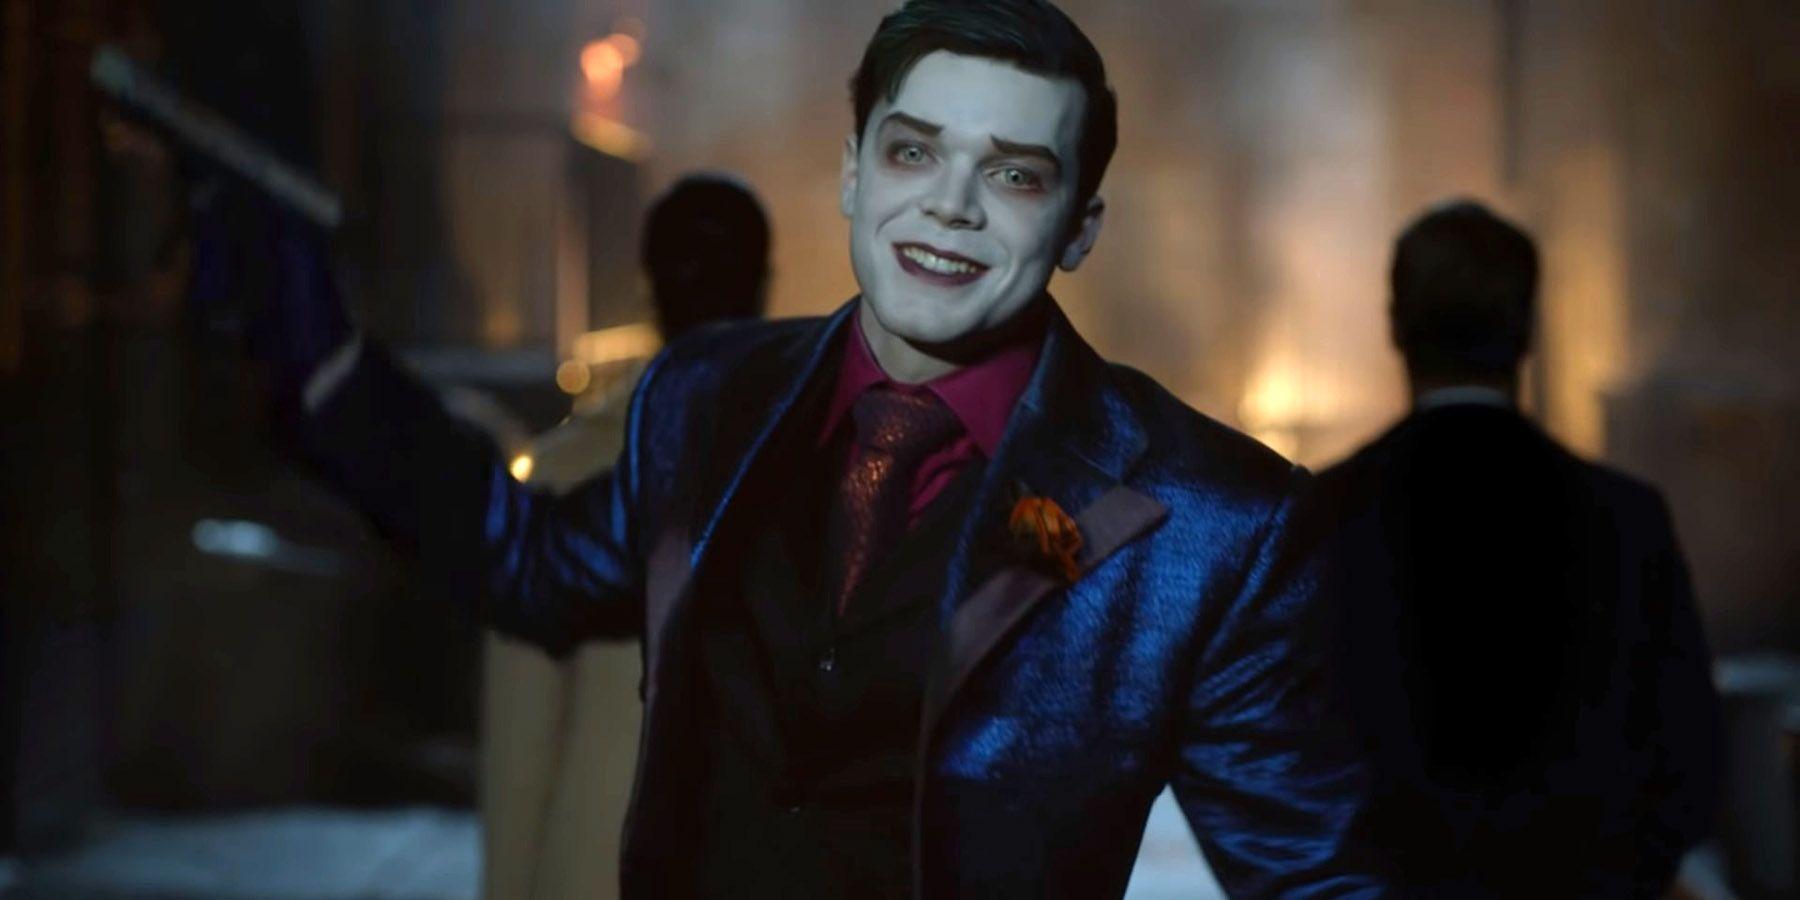 Gotham: Jeremiah Sports Joker-Esque Green Hair in New Photo | CBR